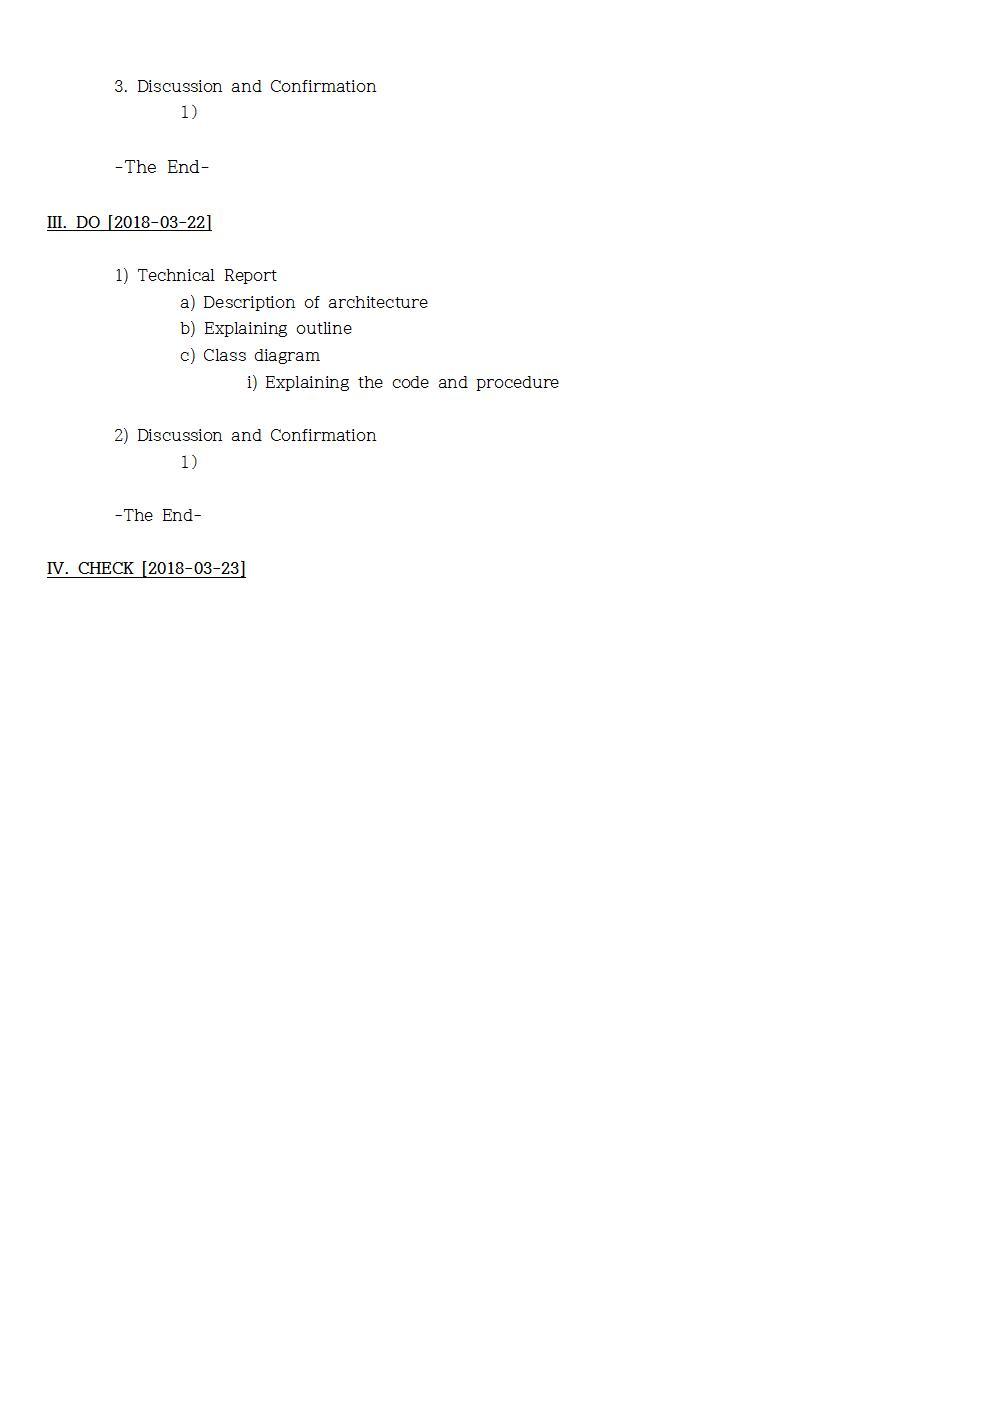 D-[18-002-RD-02]-[PRISM2.0-ADOxx]-[2018-03-22]-[MR]002.jpg